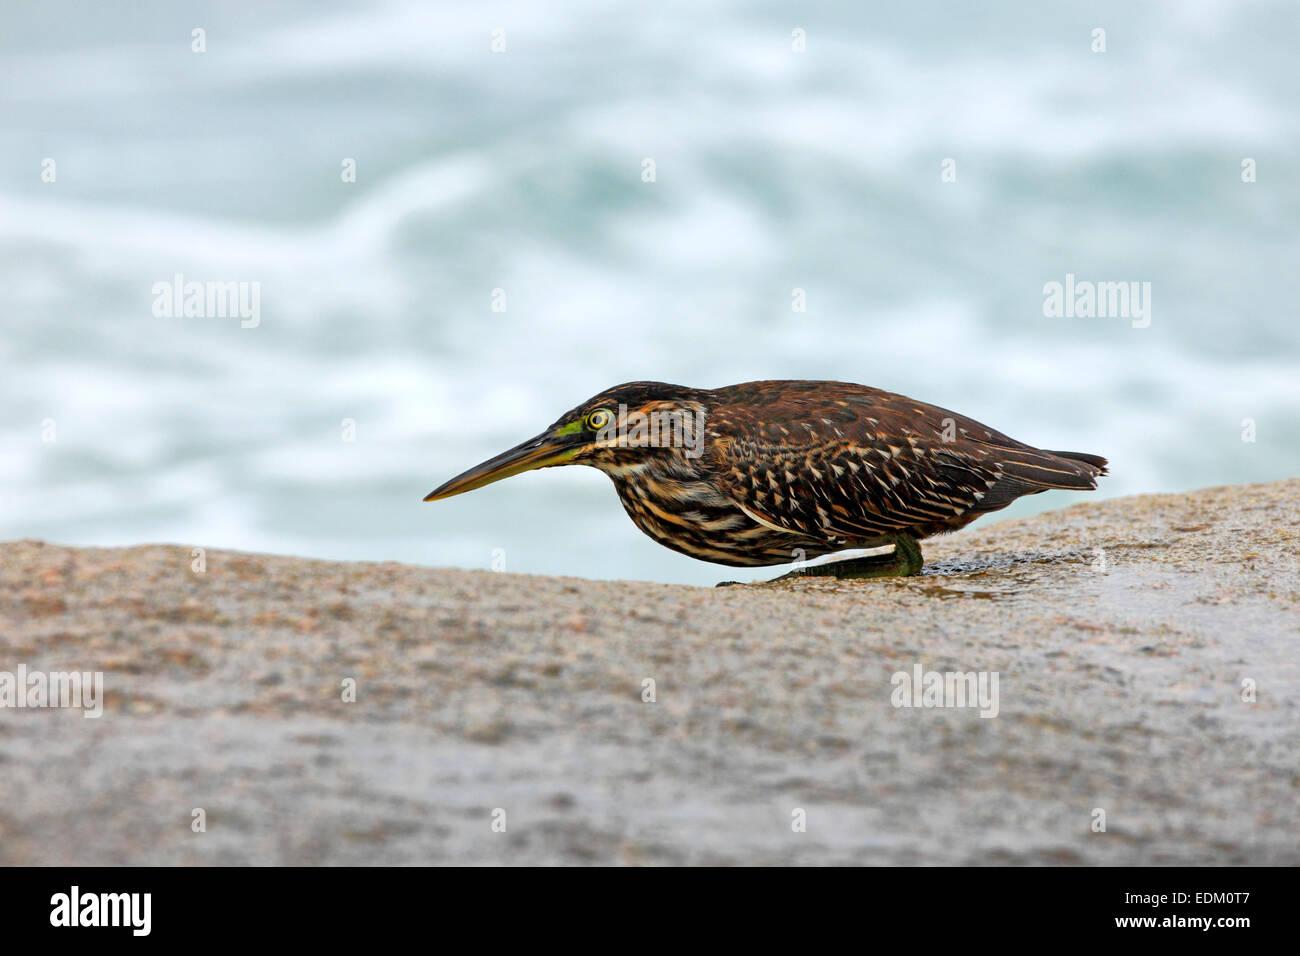 Seychelles bird, island, La Digue. Bird waiting for a fish. - Stock Image